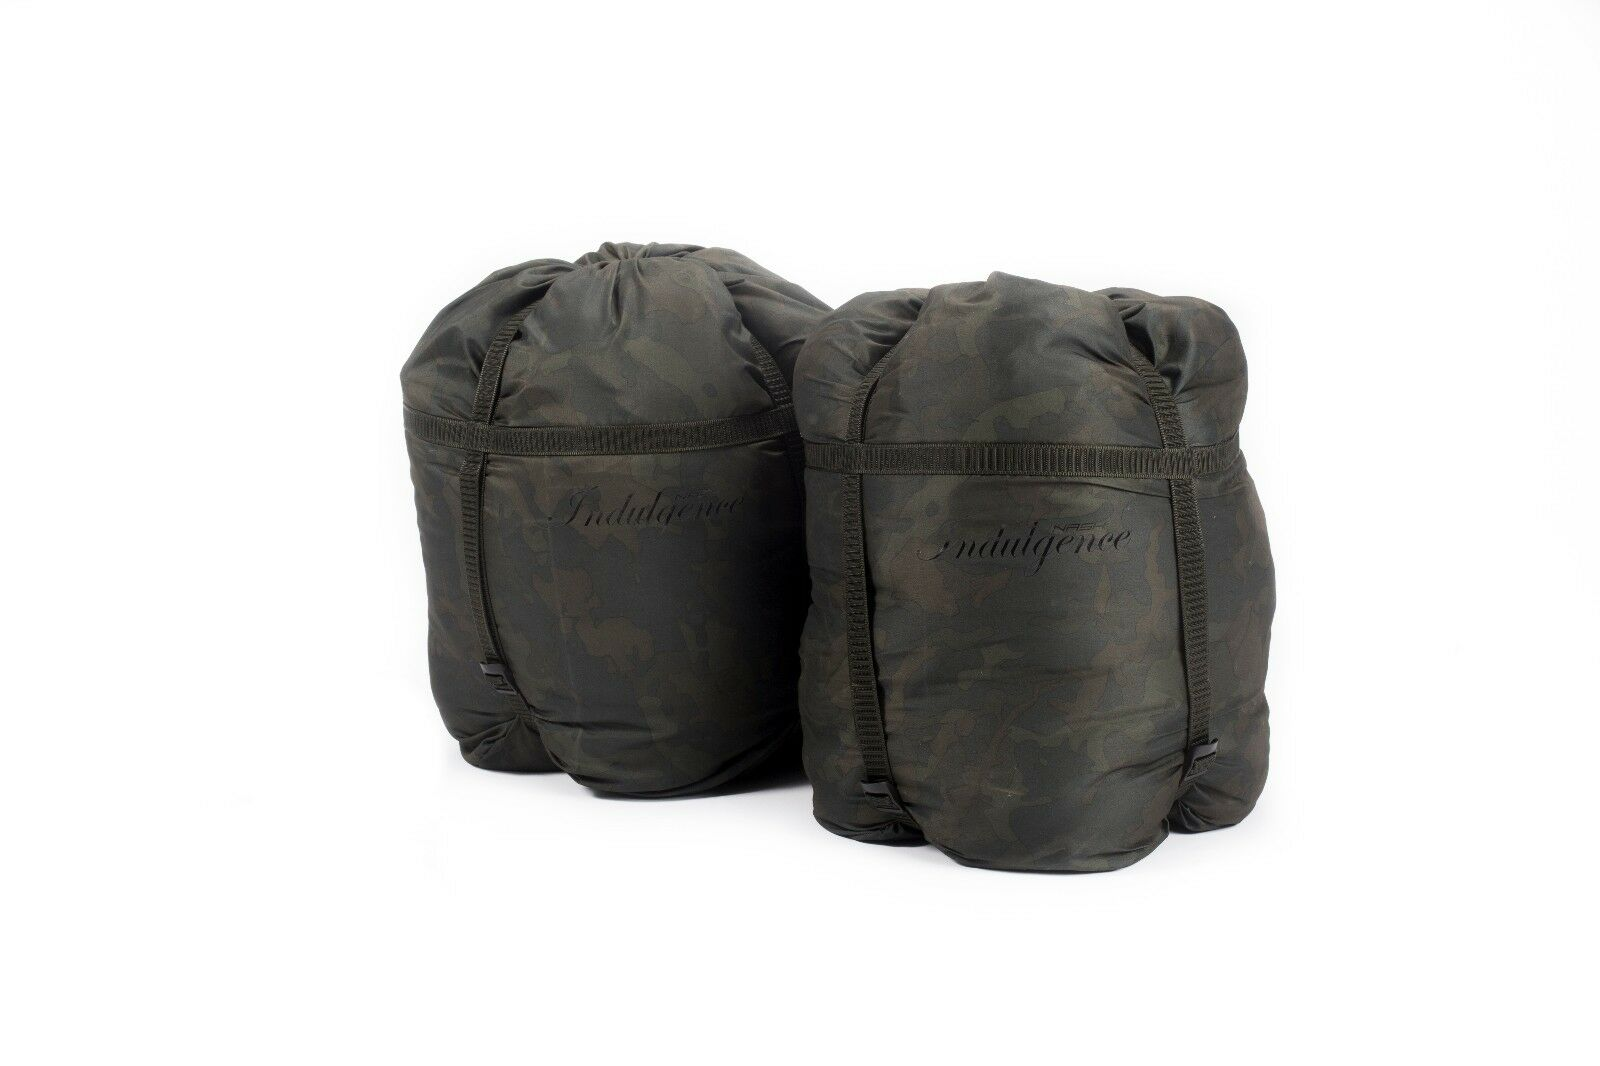 Nash Indulgence Sleeping Bags All Models NEW Carp Fishing Sleeping Bag